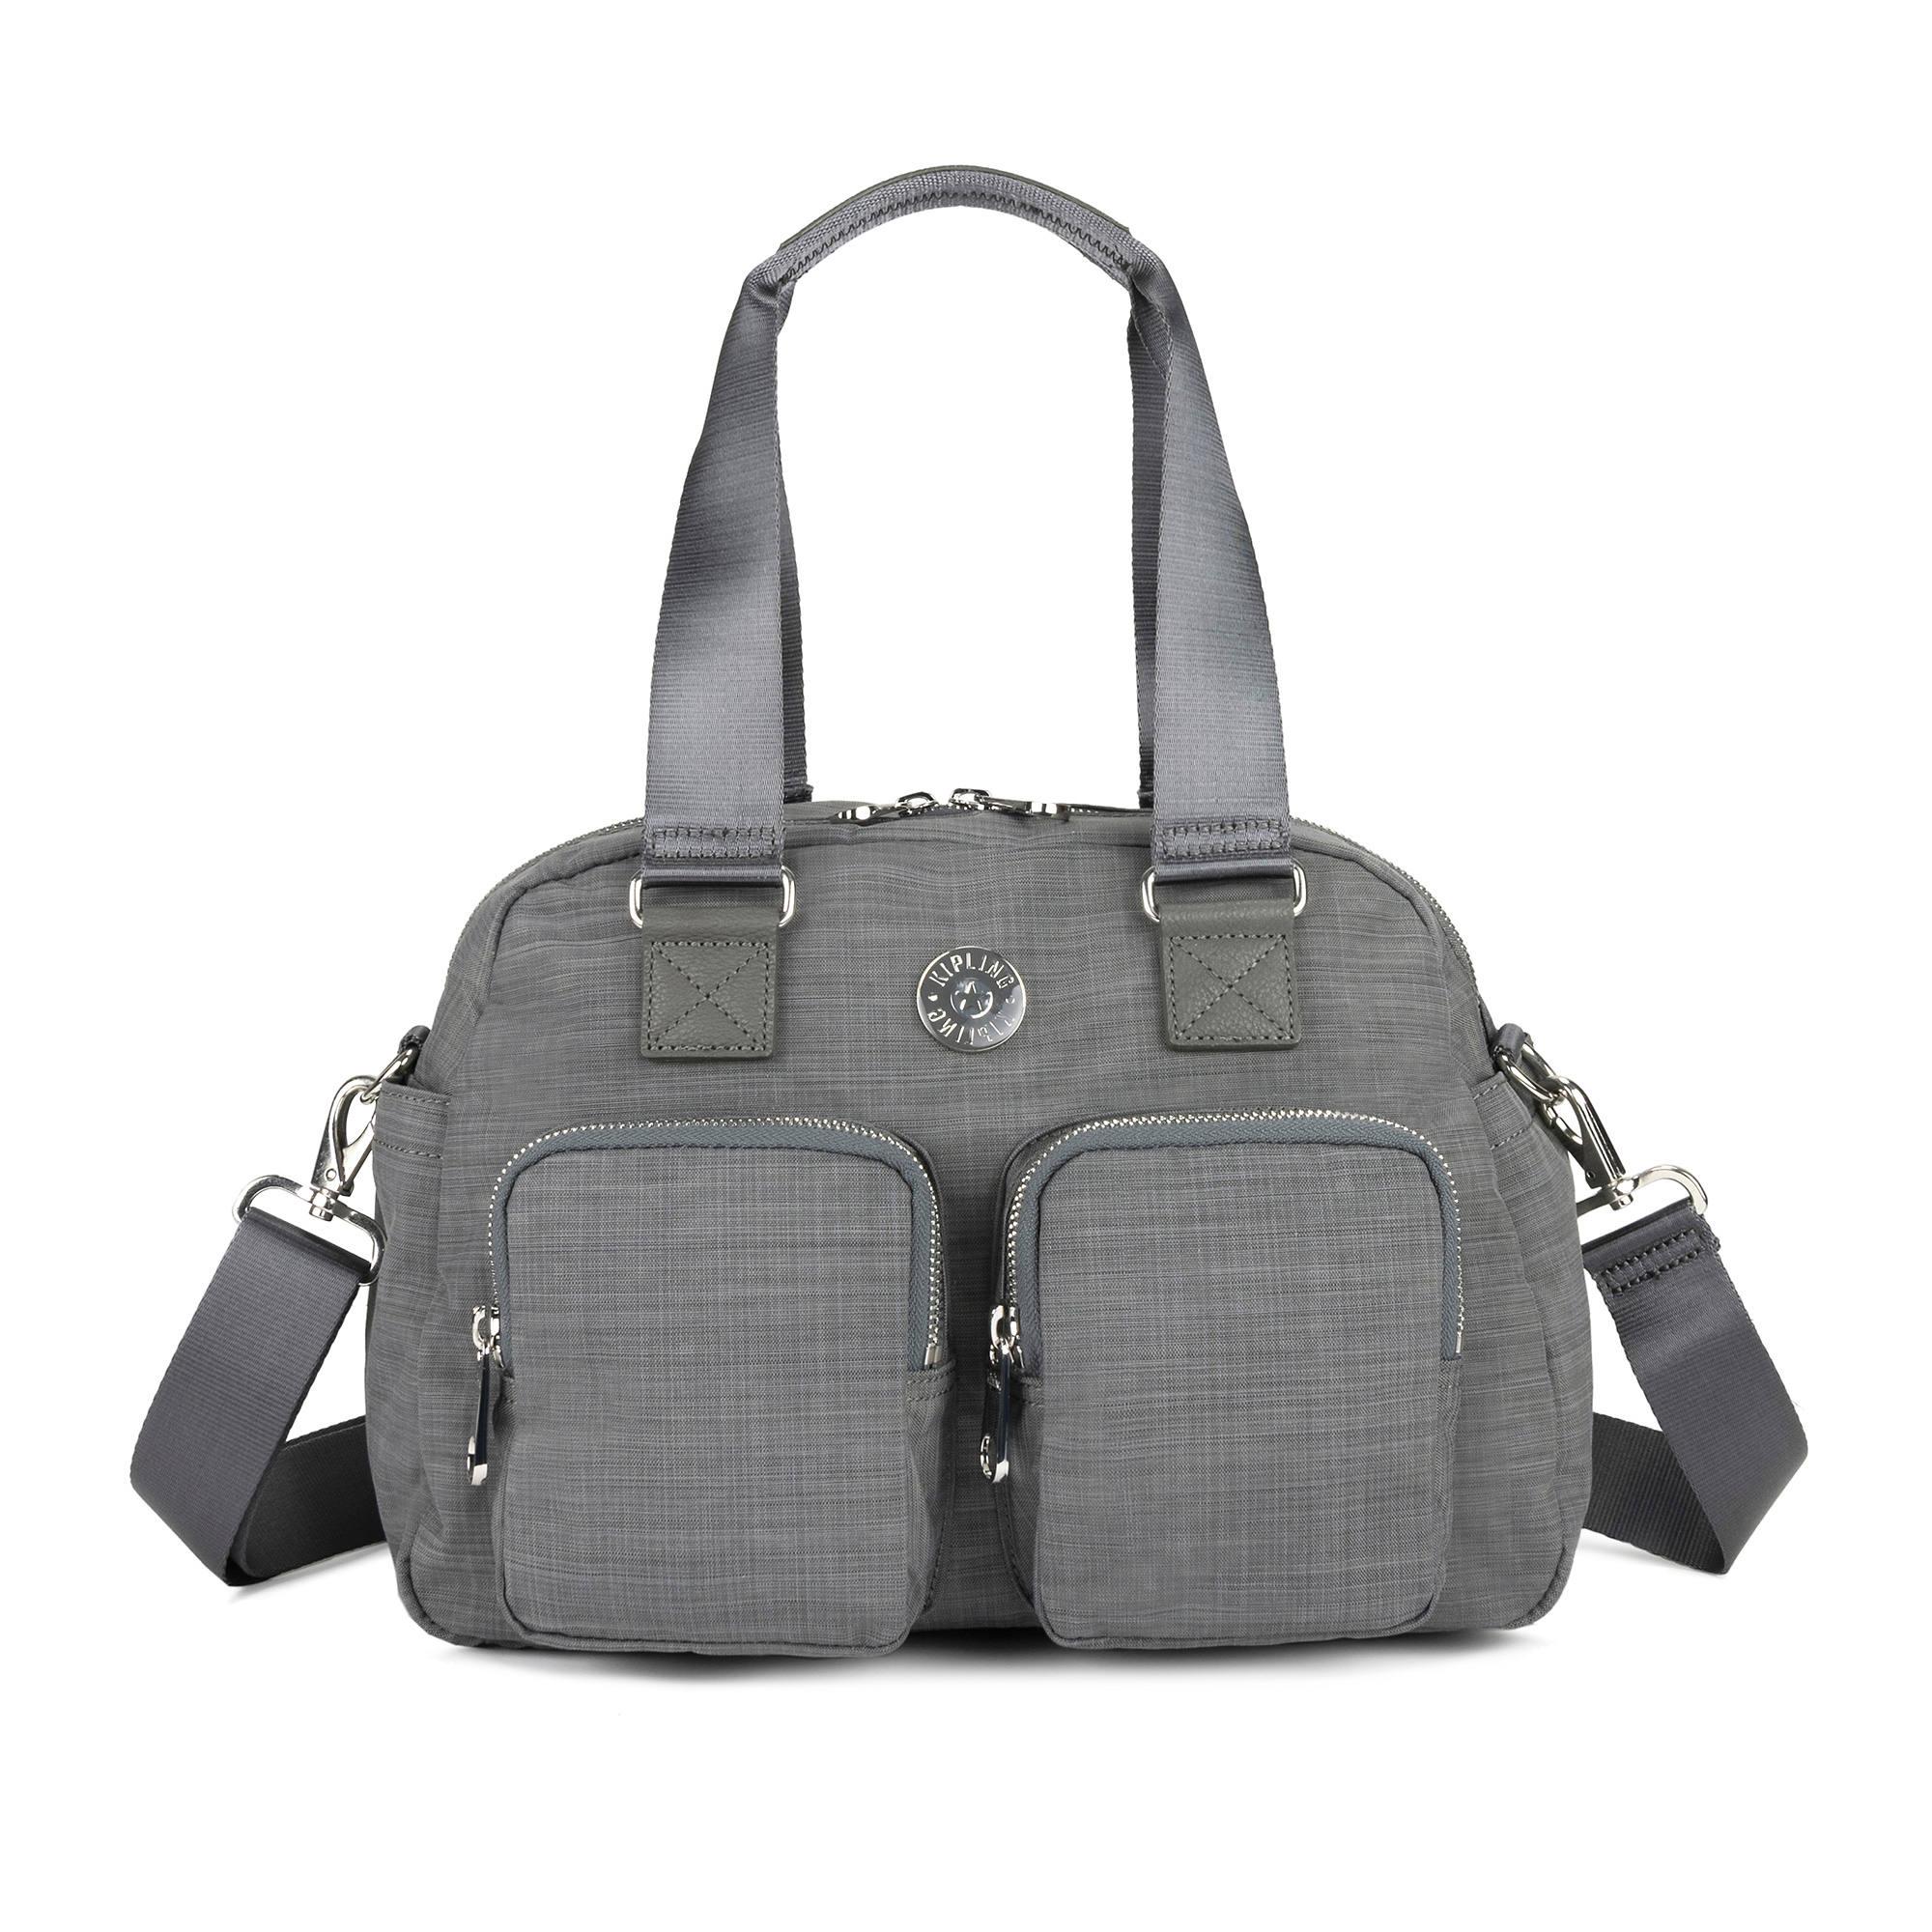 Defea Handbag,Dusty Grey Dazz,large-zoomed